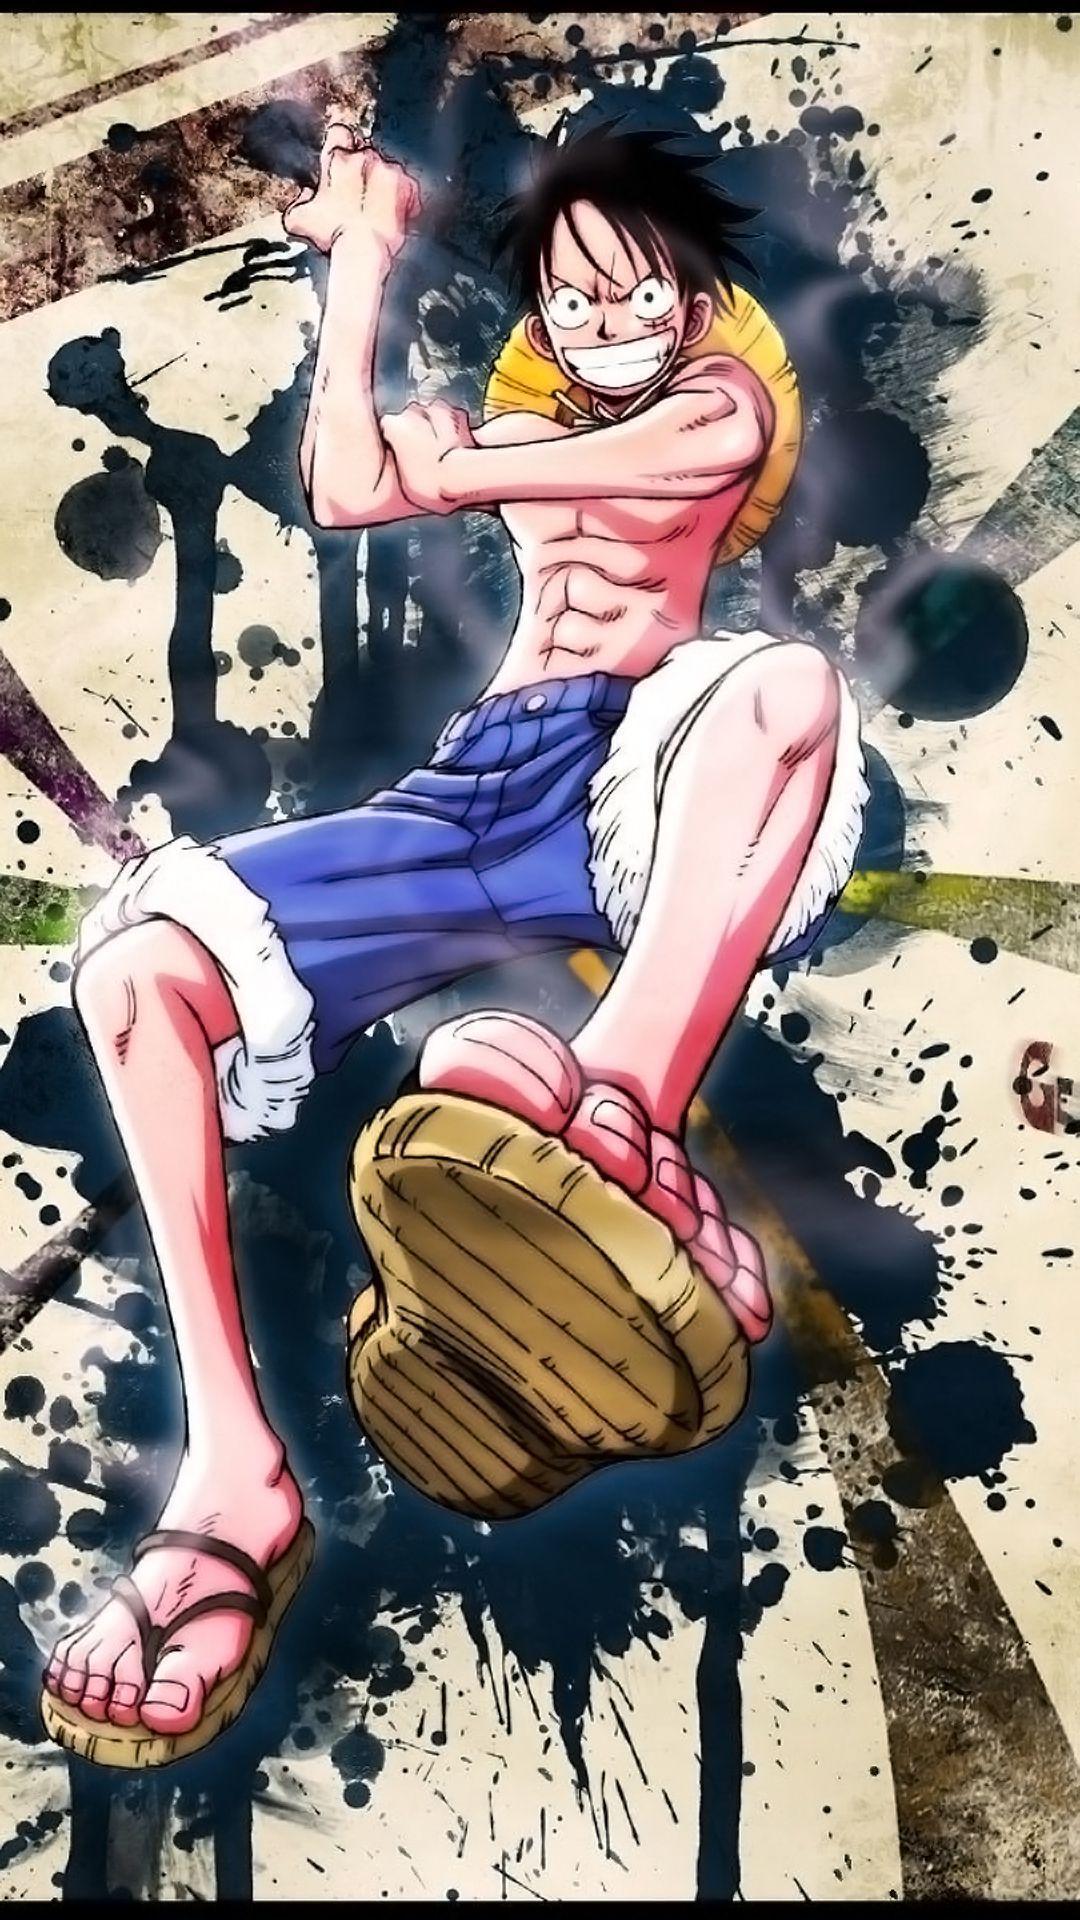 1080x1920 One Piece Hình Nền iPhone HD